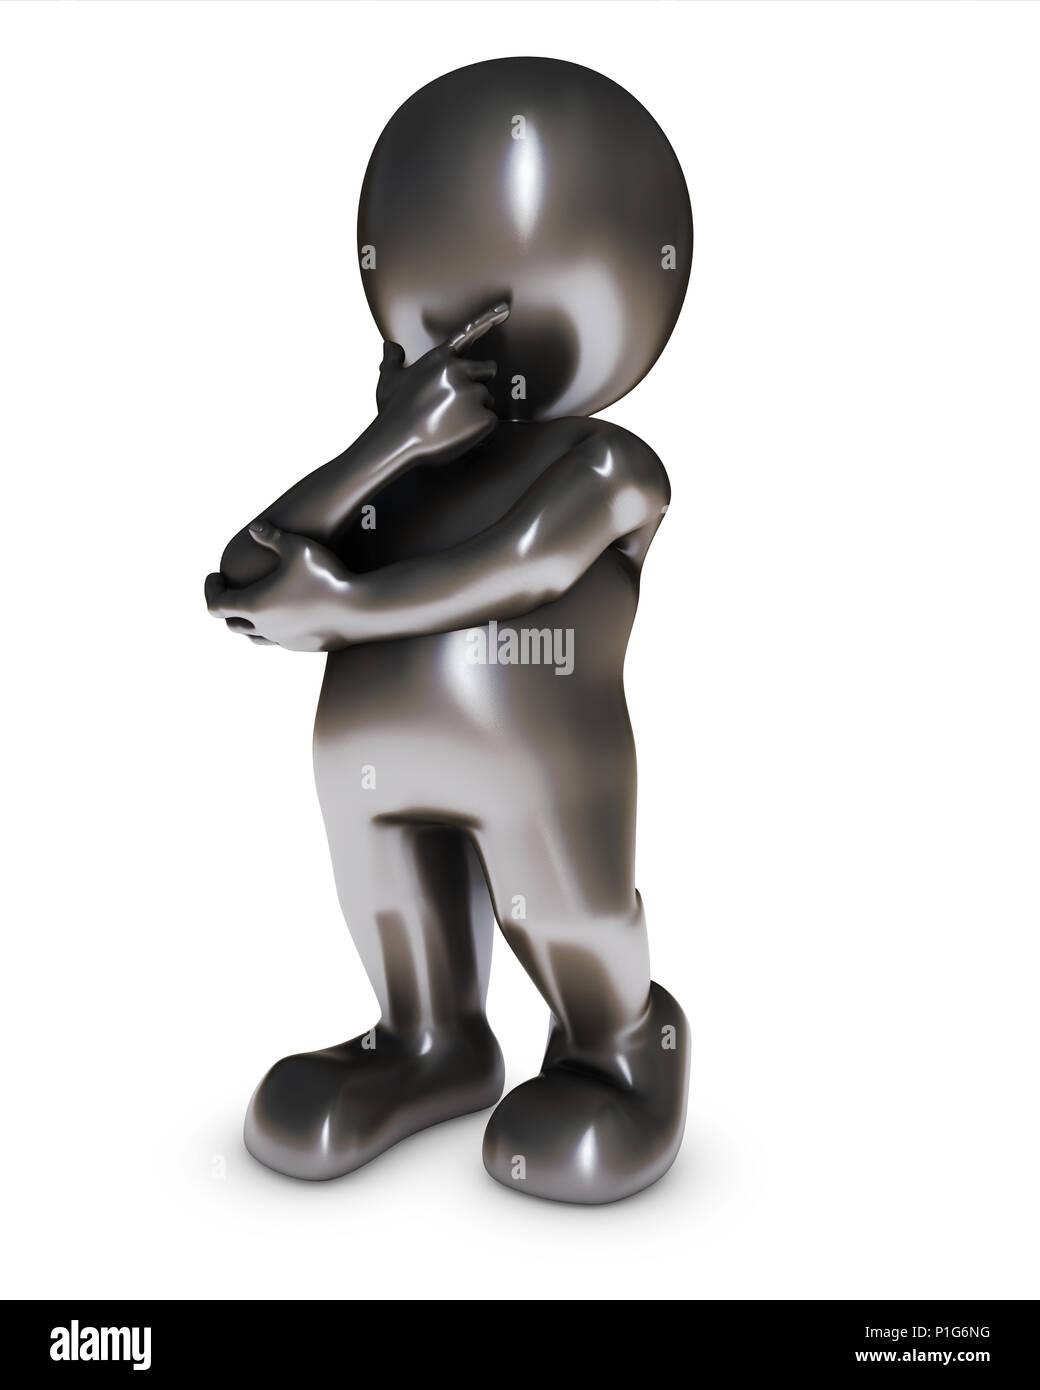 3D Render of Morph Man thinking - Stock Image